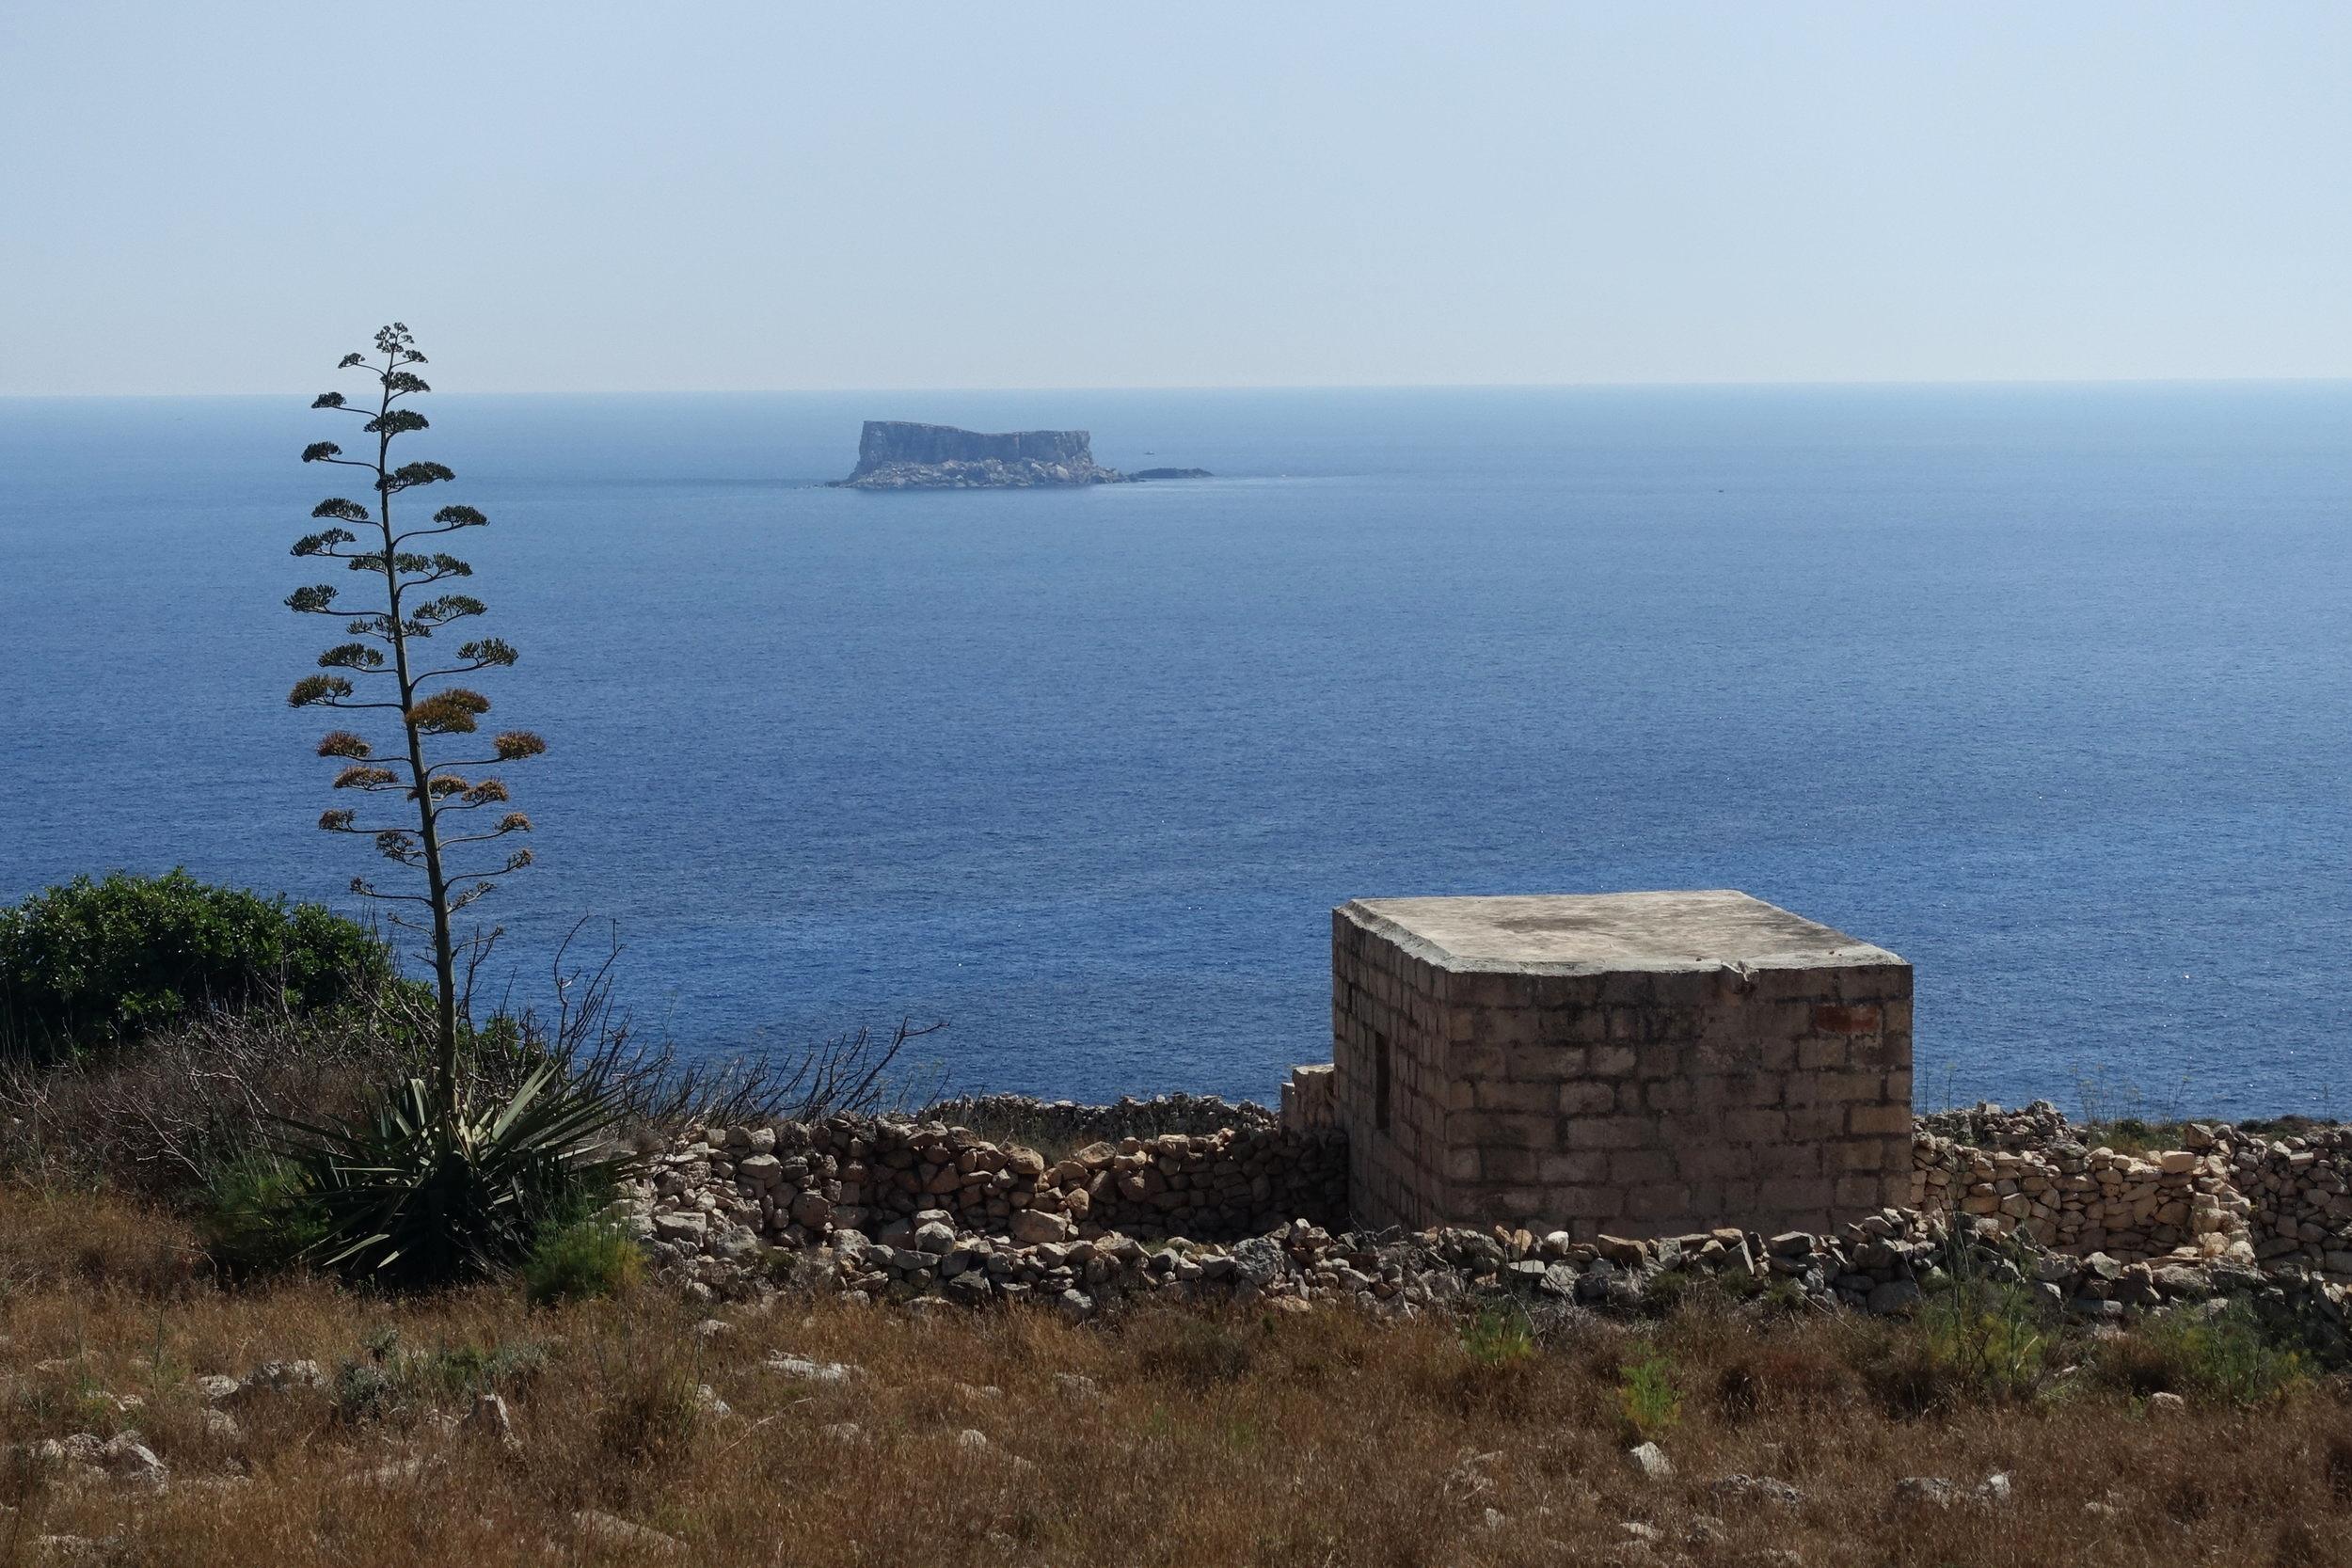 the island of filfla off the south coast